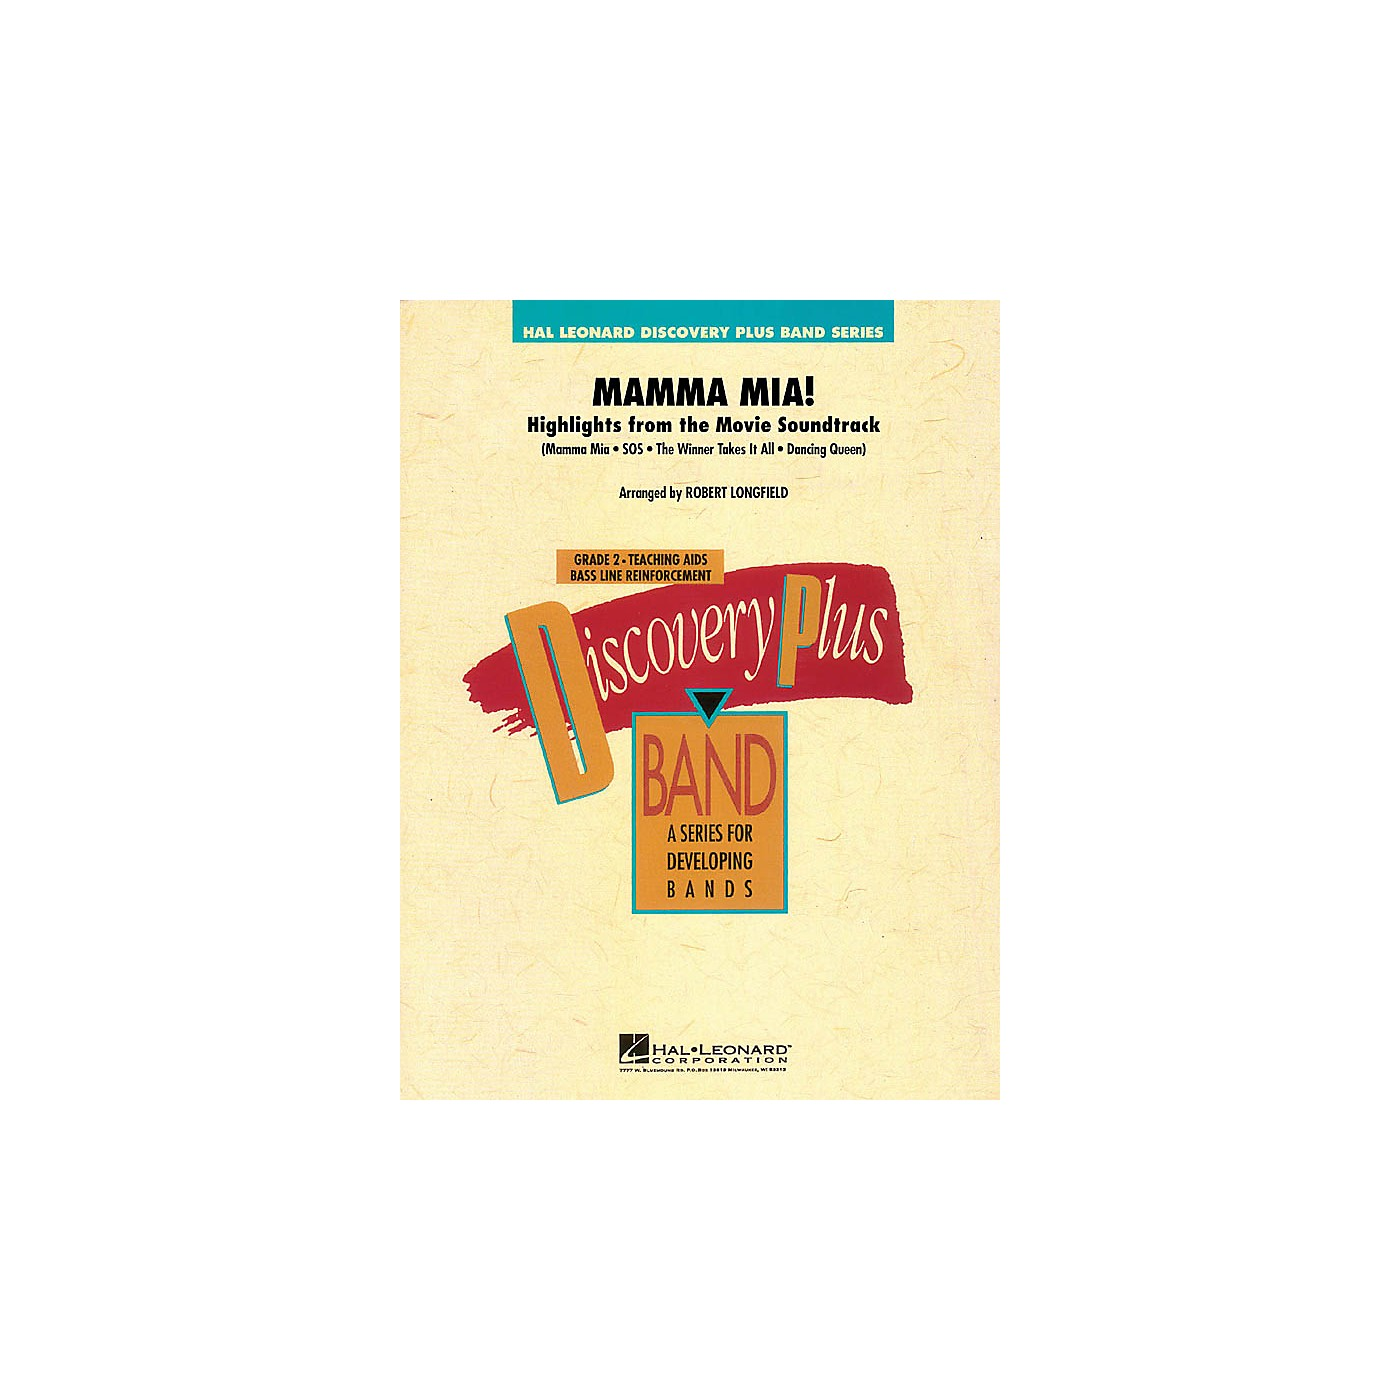 Hal Leonard Mamma Mia! - Highlights from the Movie Soundtrack - Band Level 2 arranged by Robert Longfield thumbnail